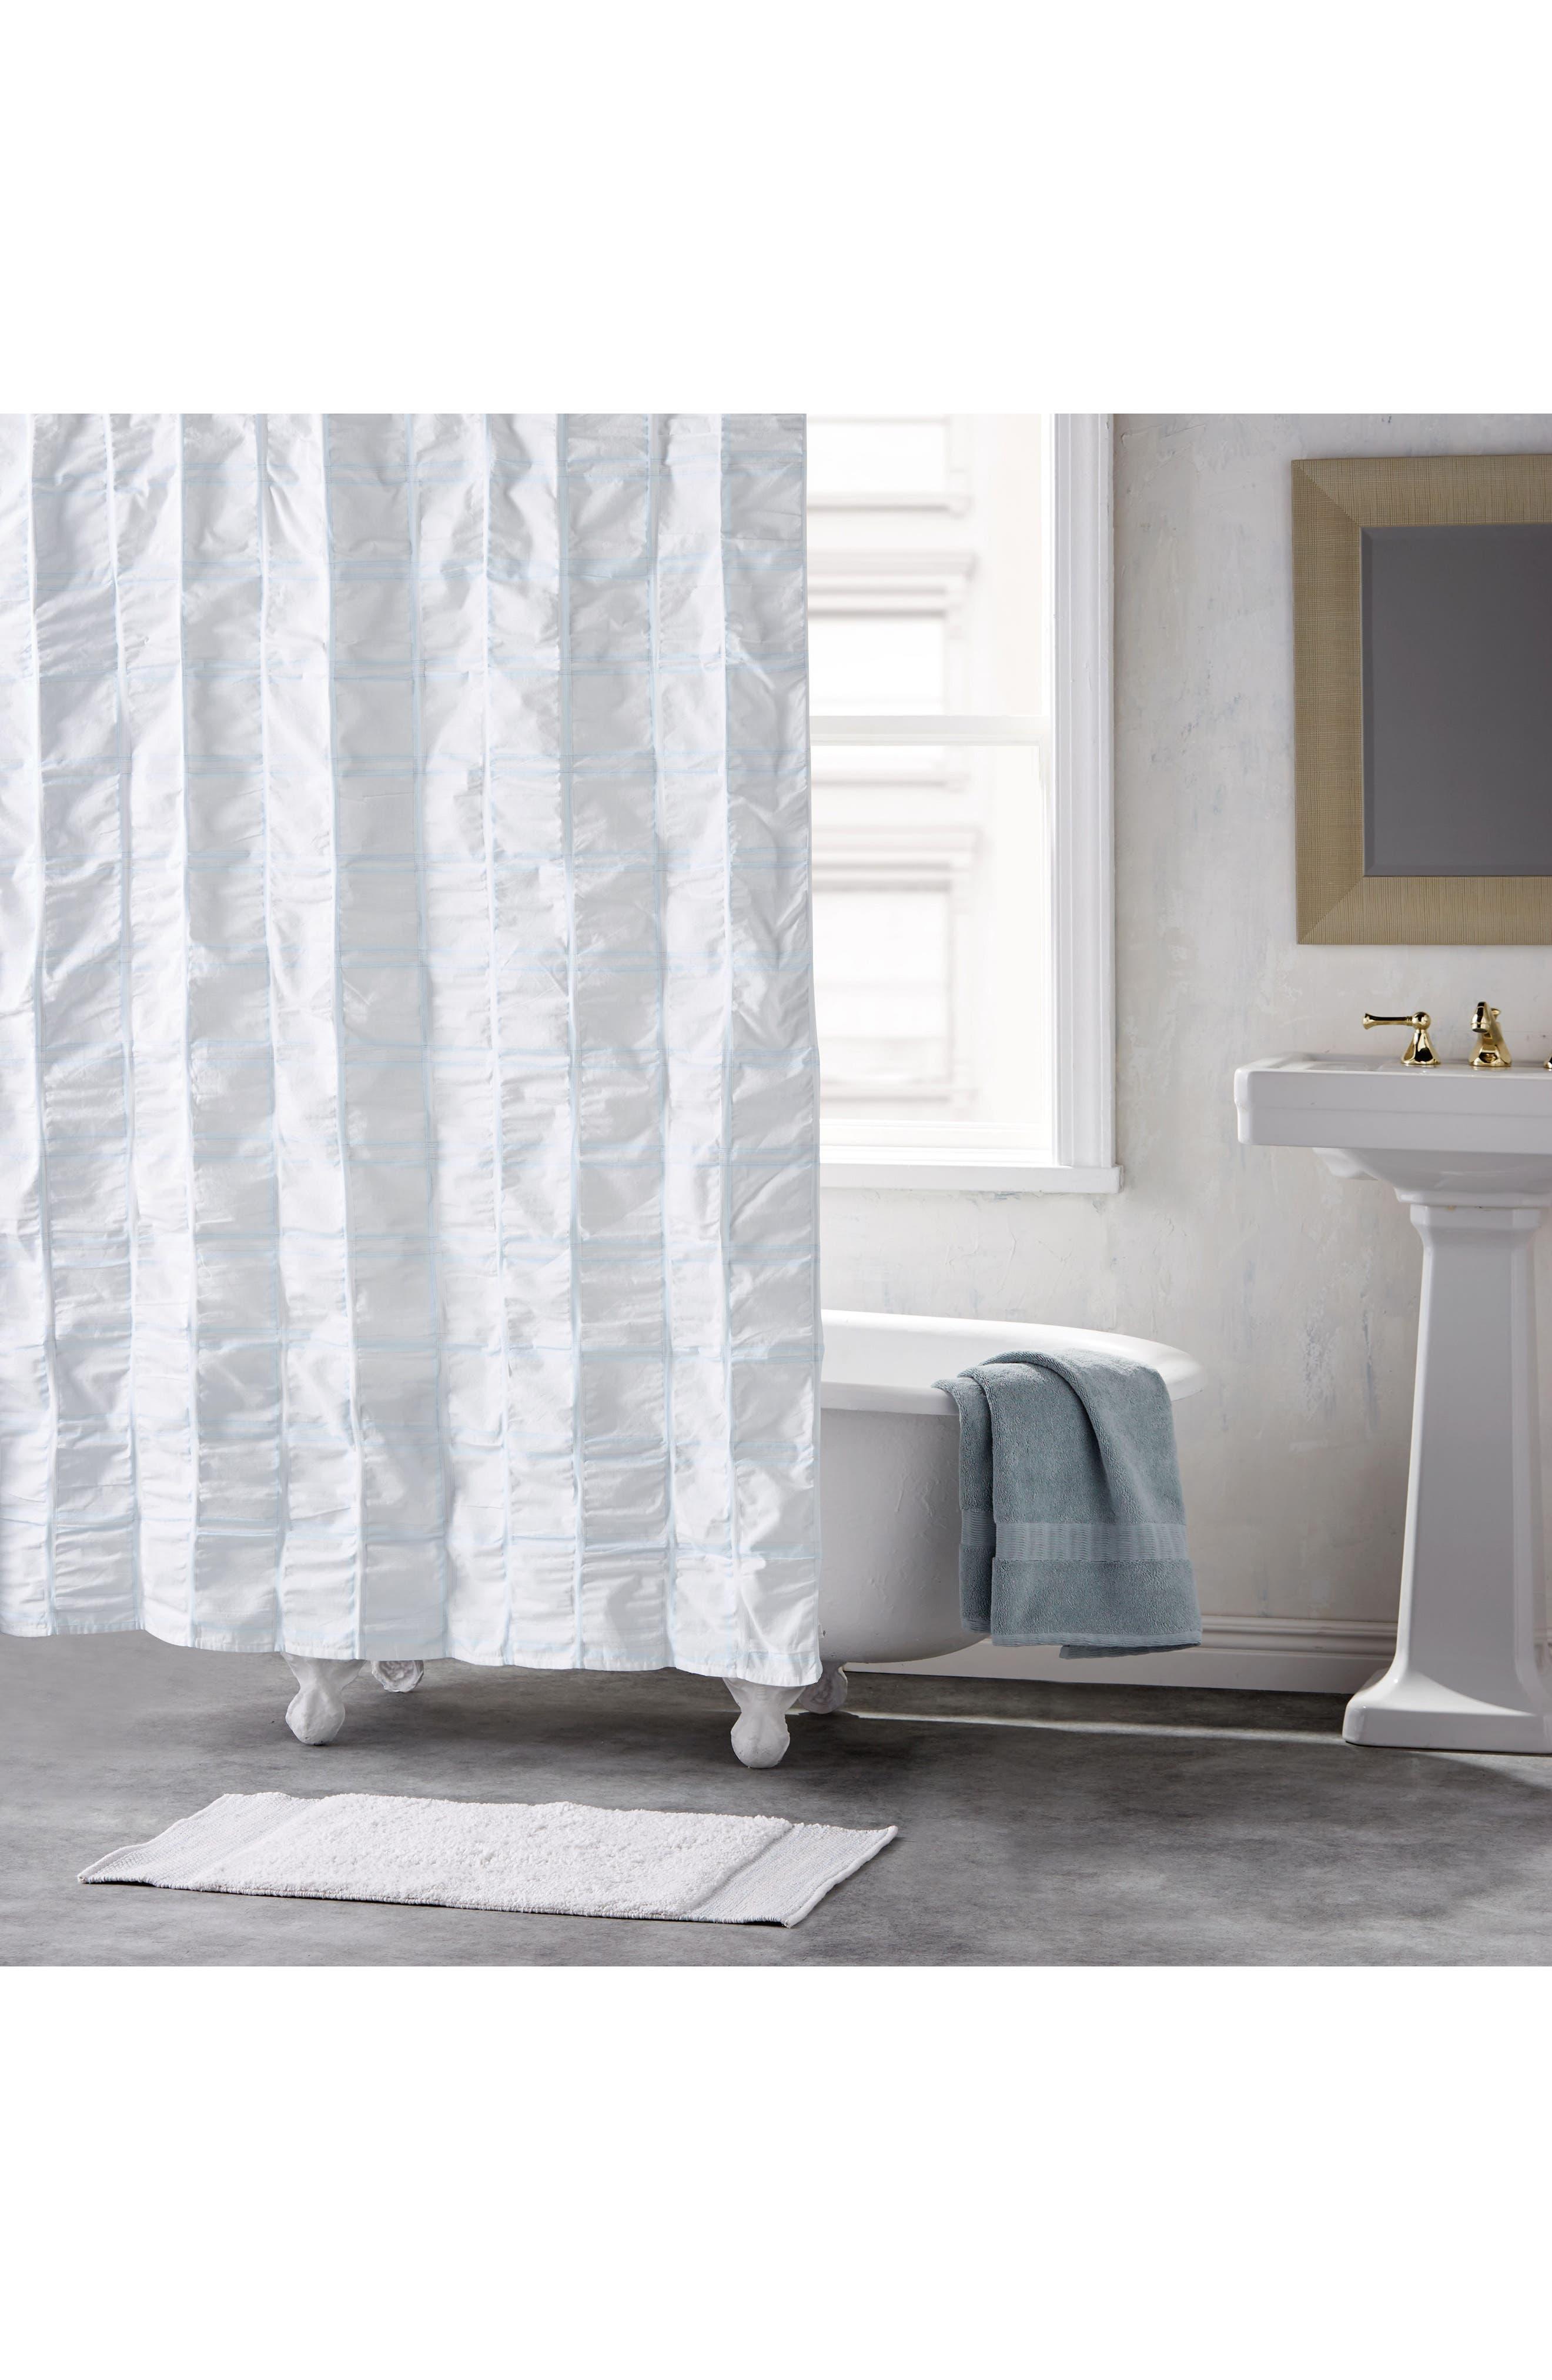 DKNY Check Please Shower Curtain